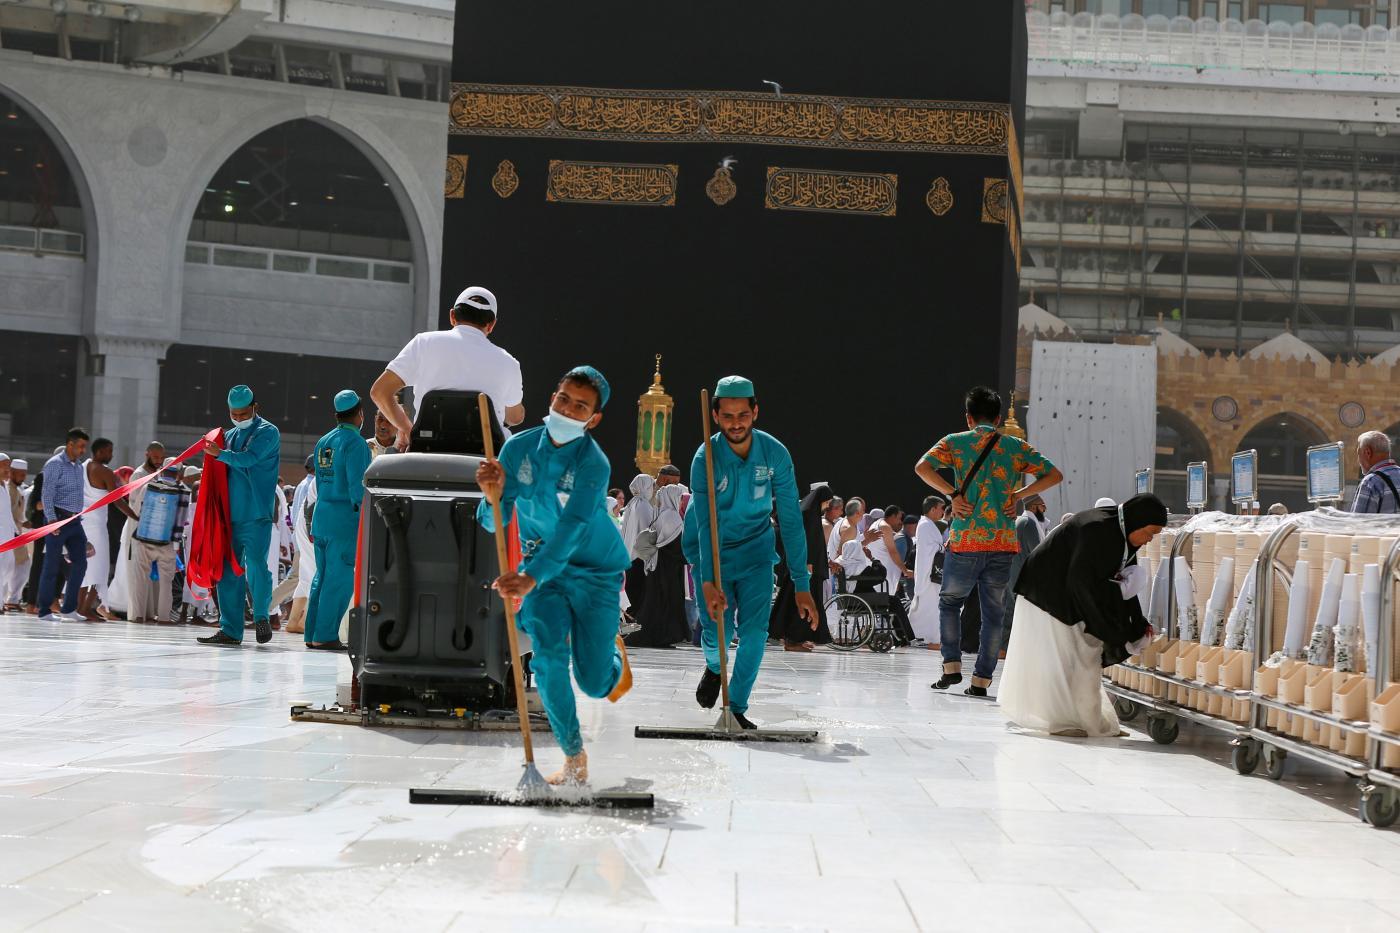 Coronavirus: Saudi Arabia Bans All Umrah Pilgrimage to Mecca